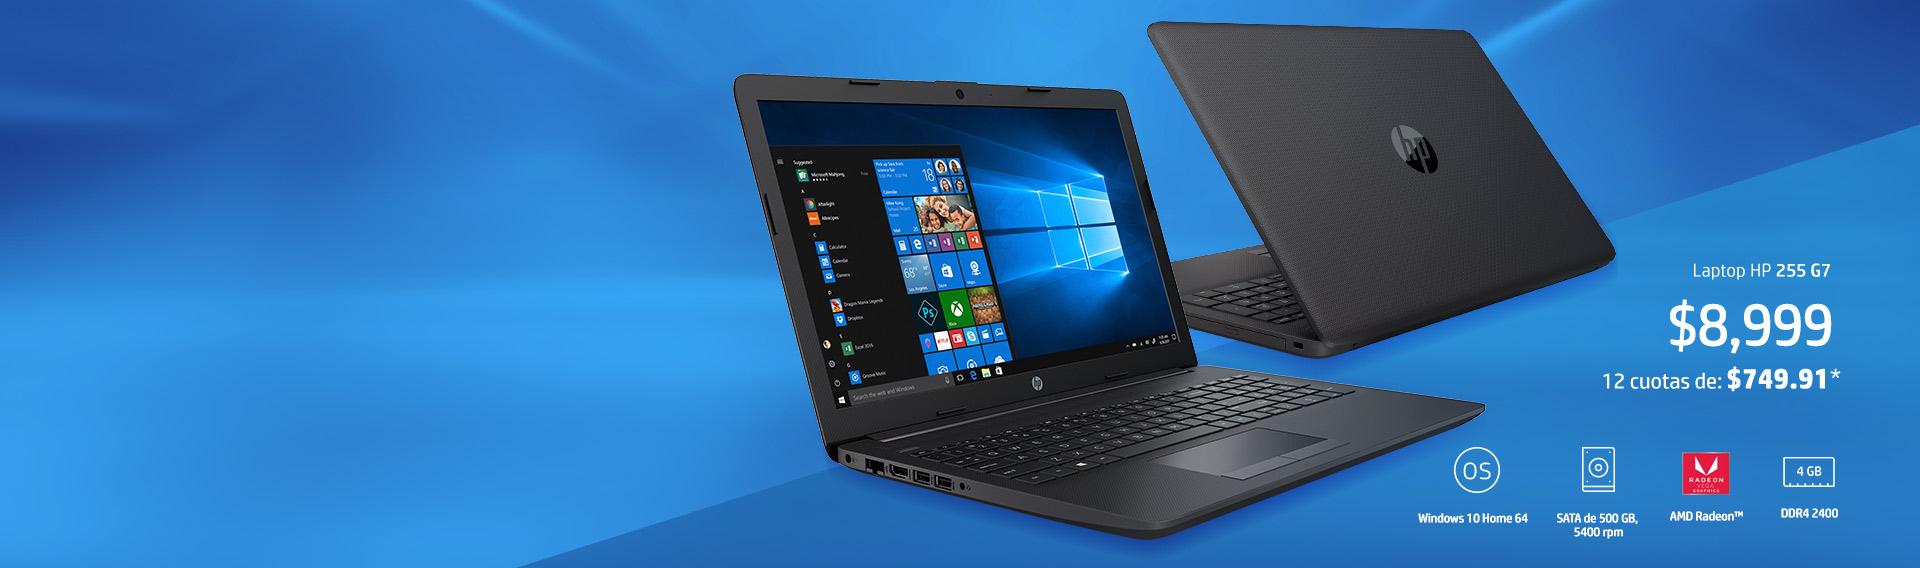 Laptop 255 G7 $8,999